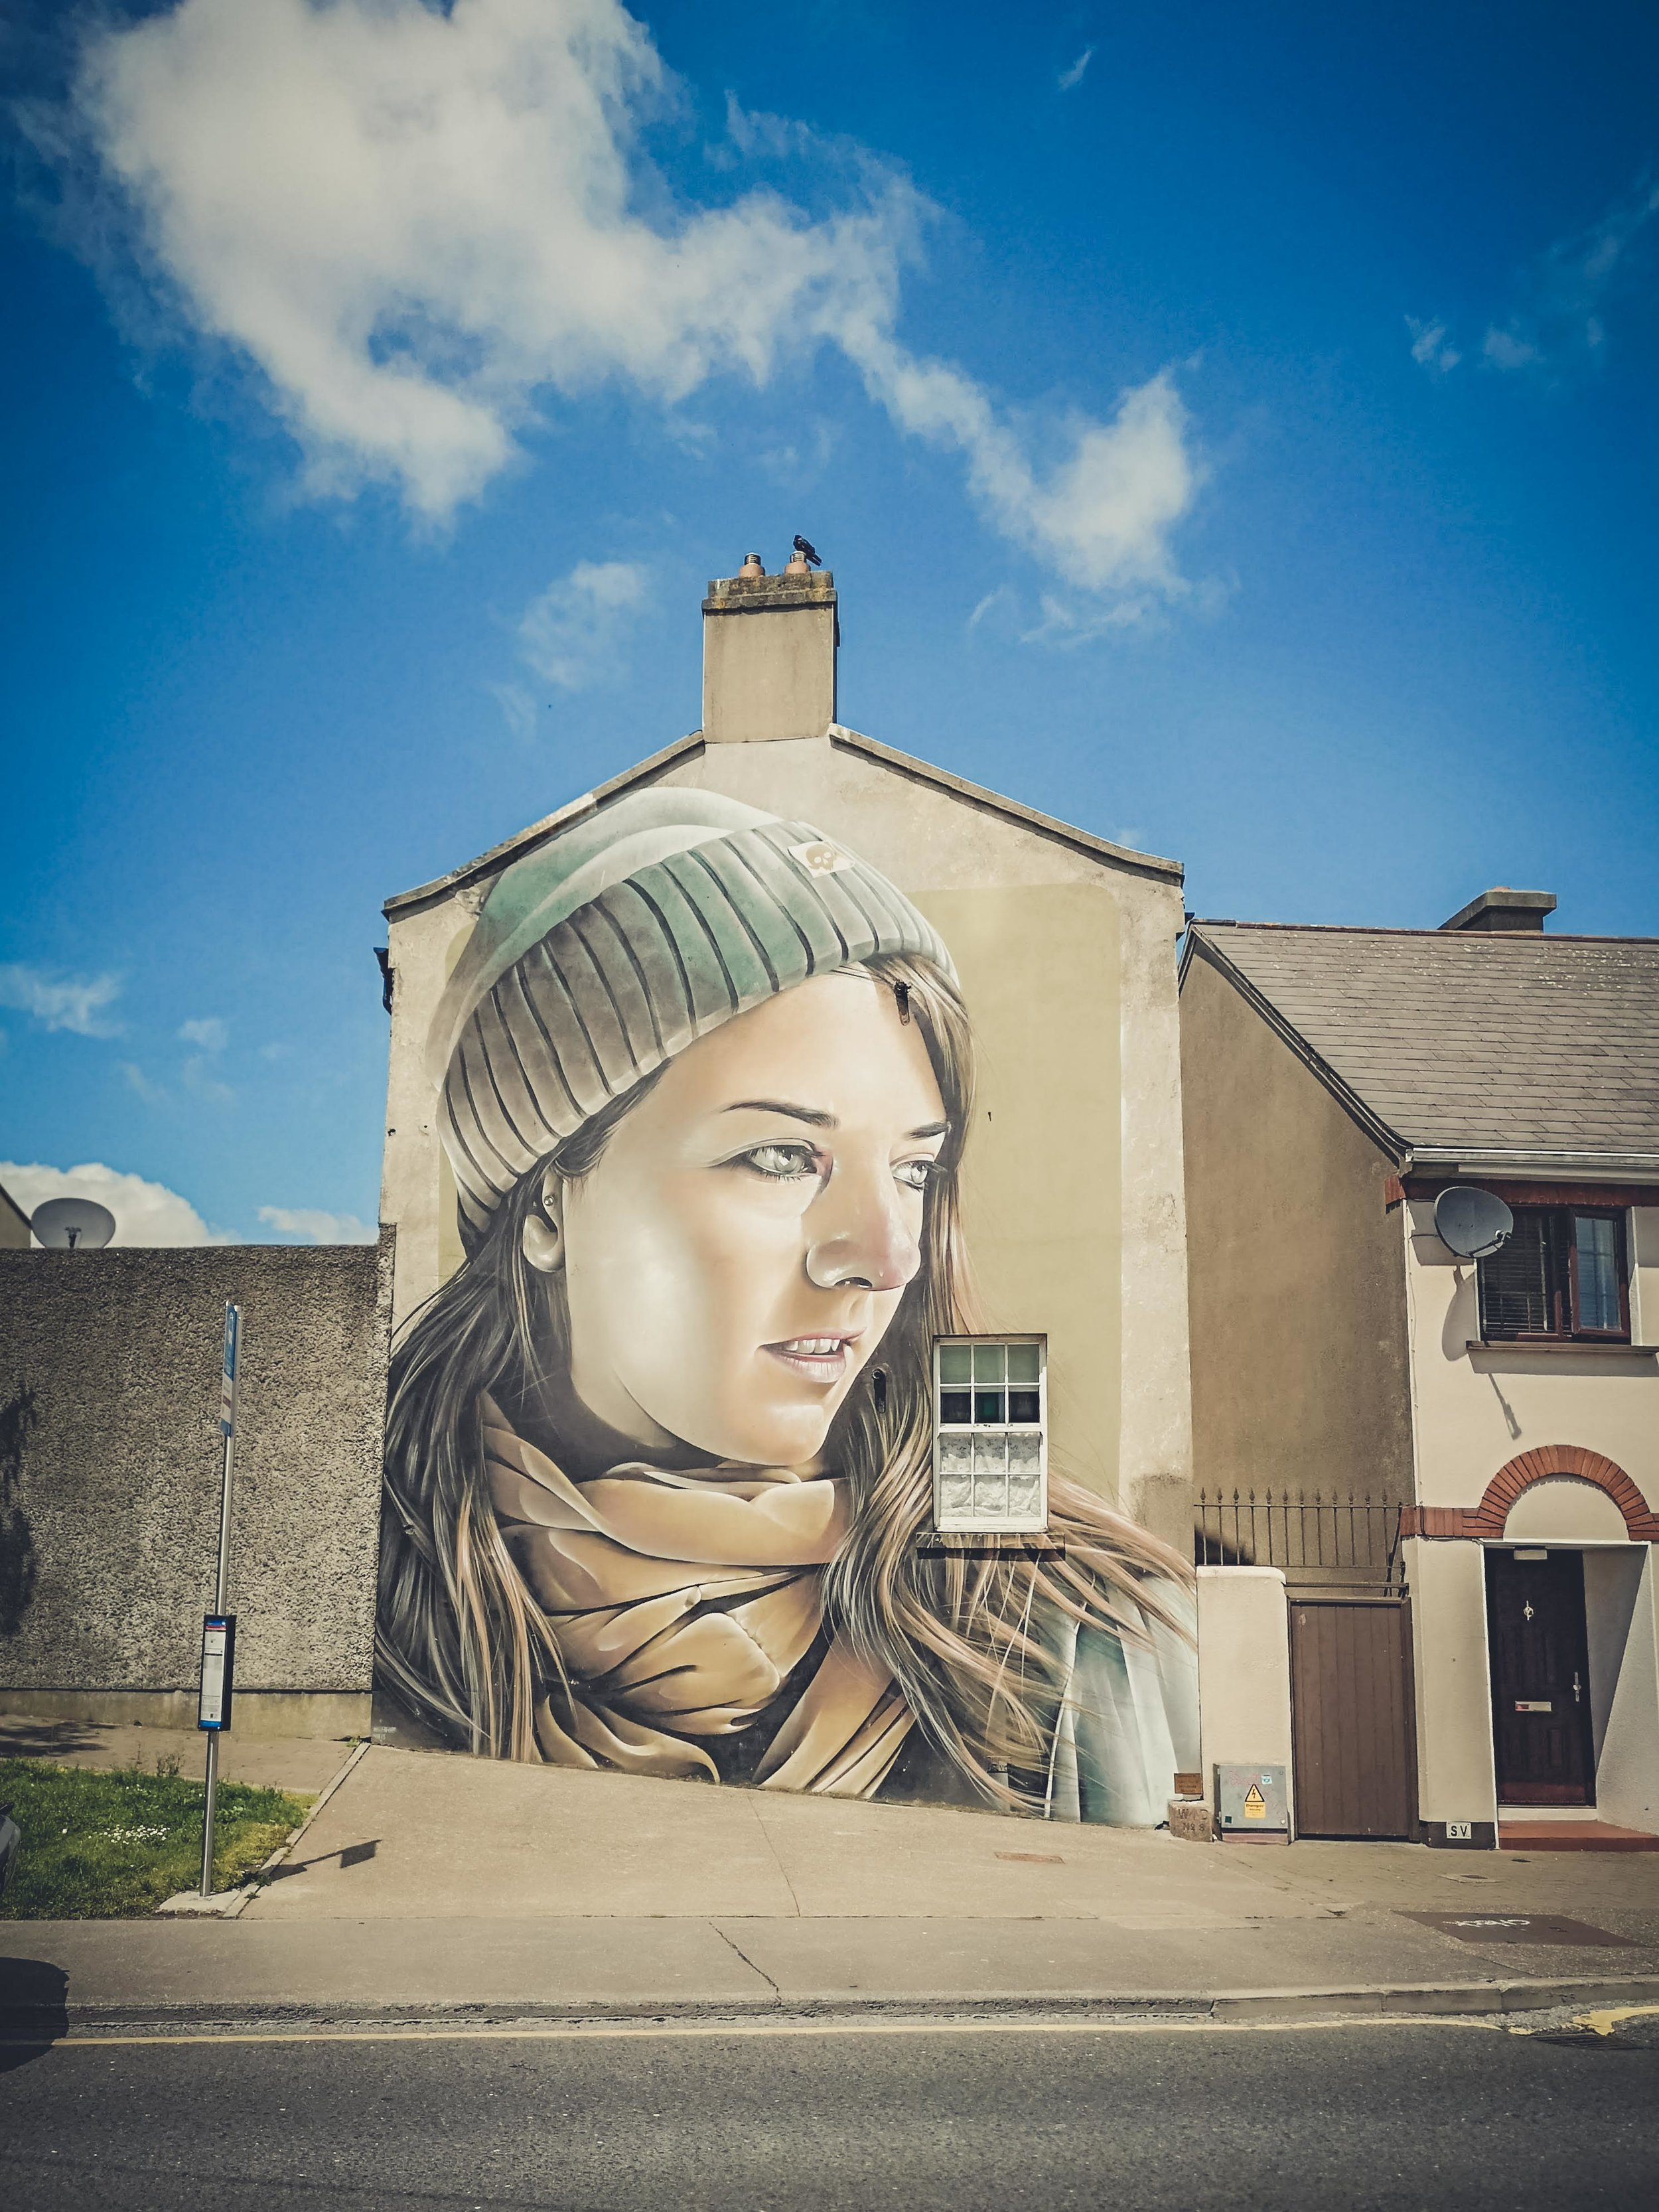 waterford ireland streetart.,.jpg